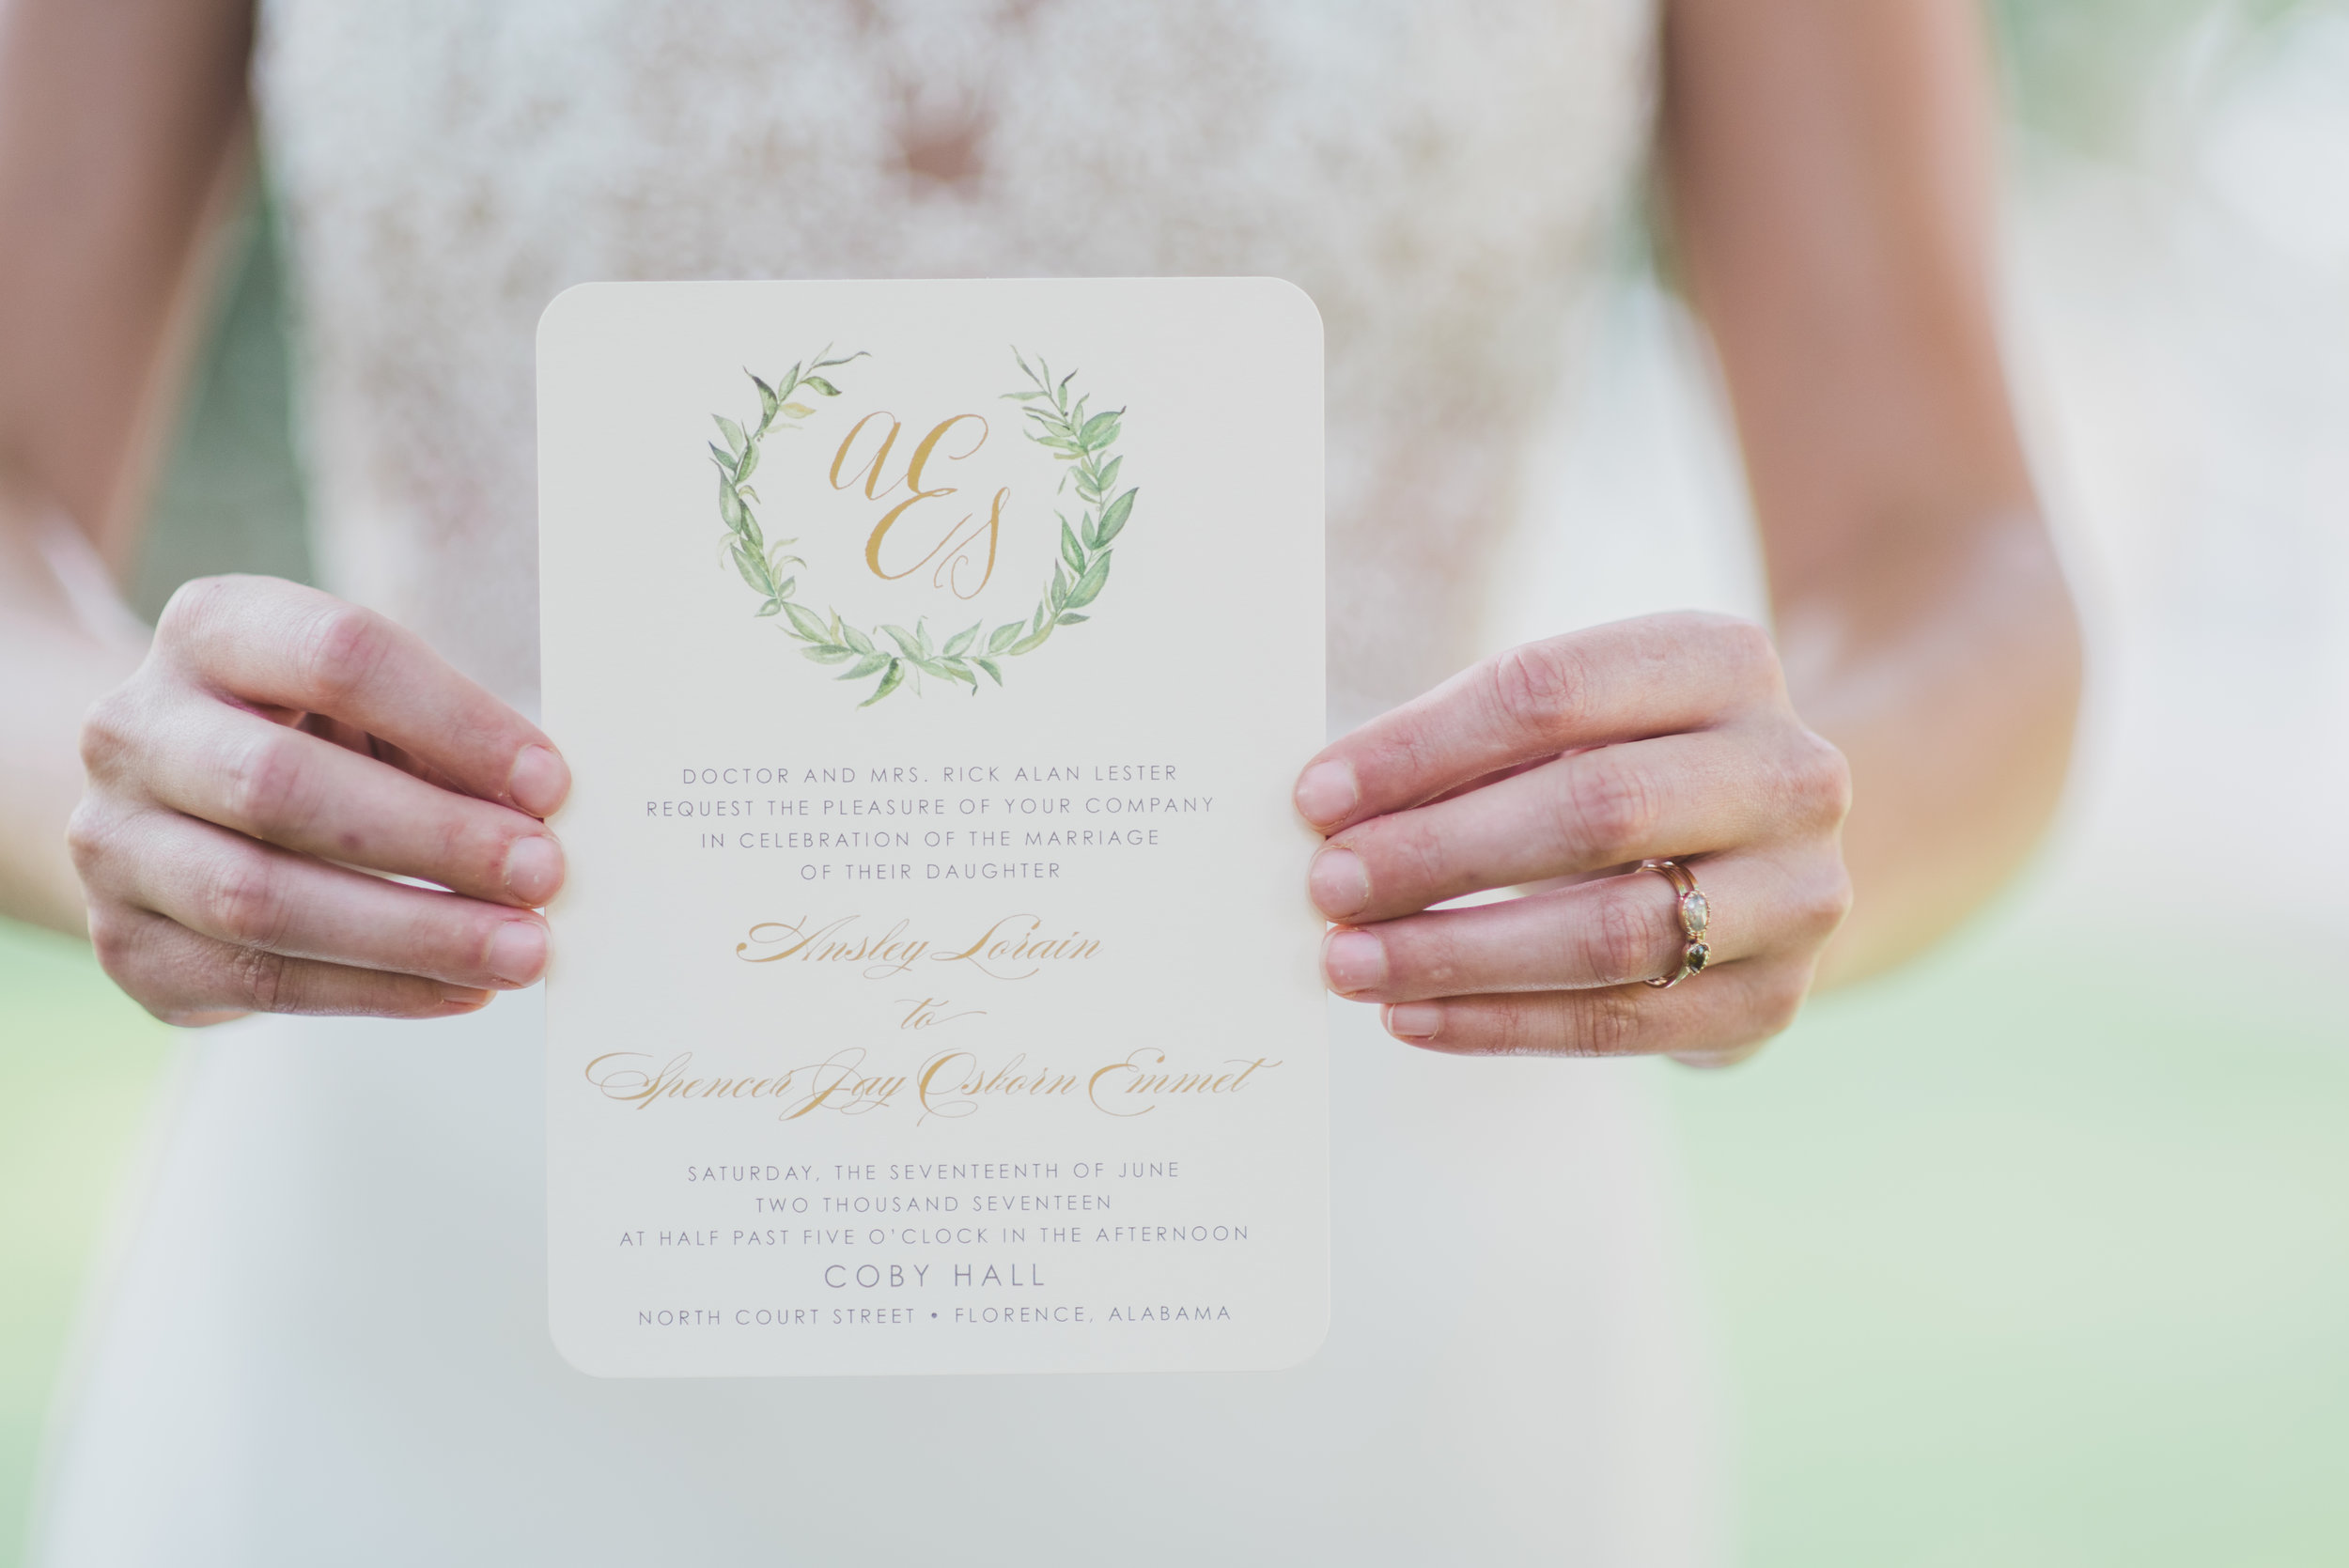 Elegant Garden Photo Shoot : Invitation